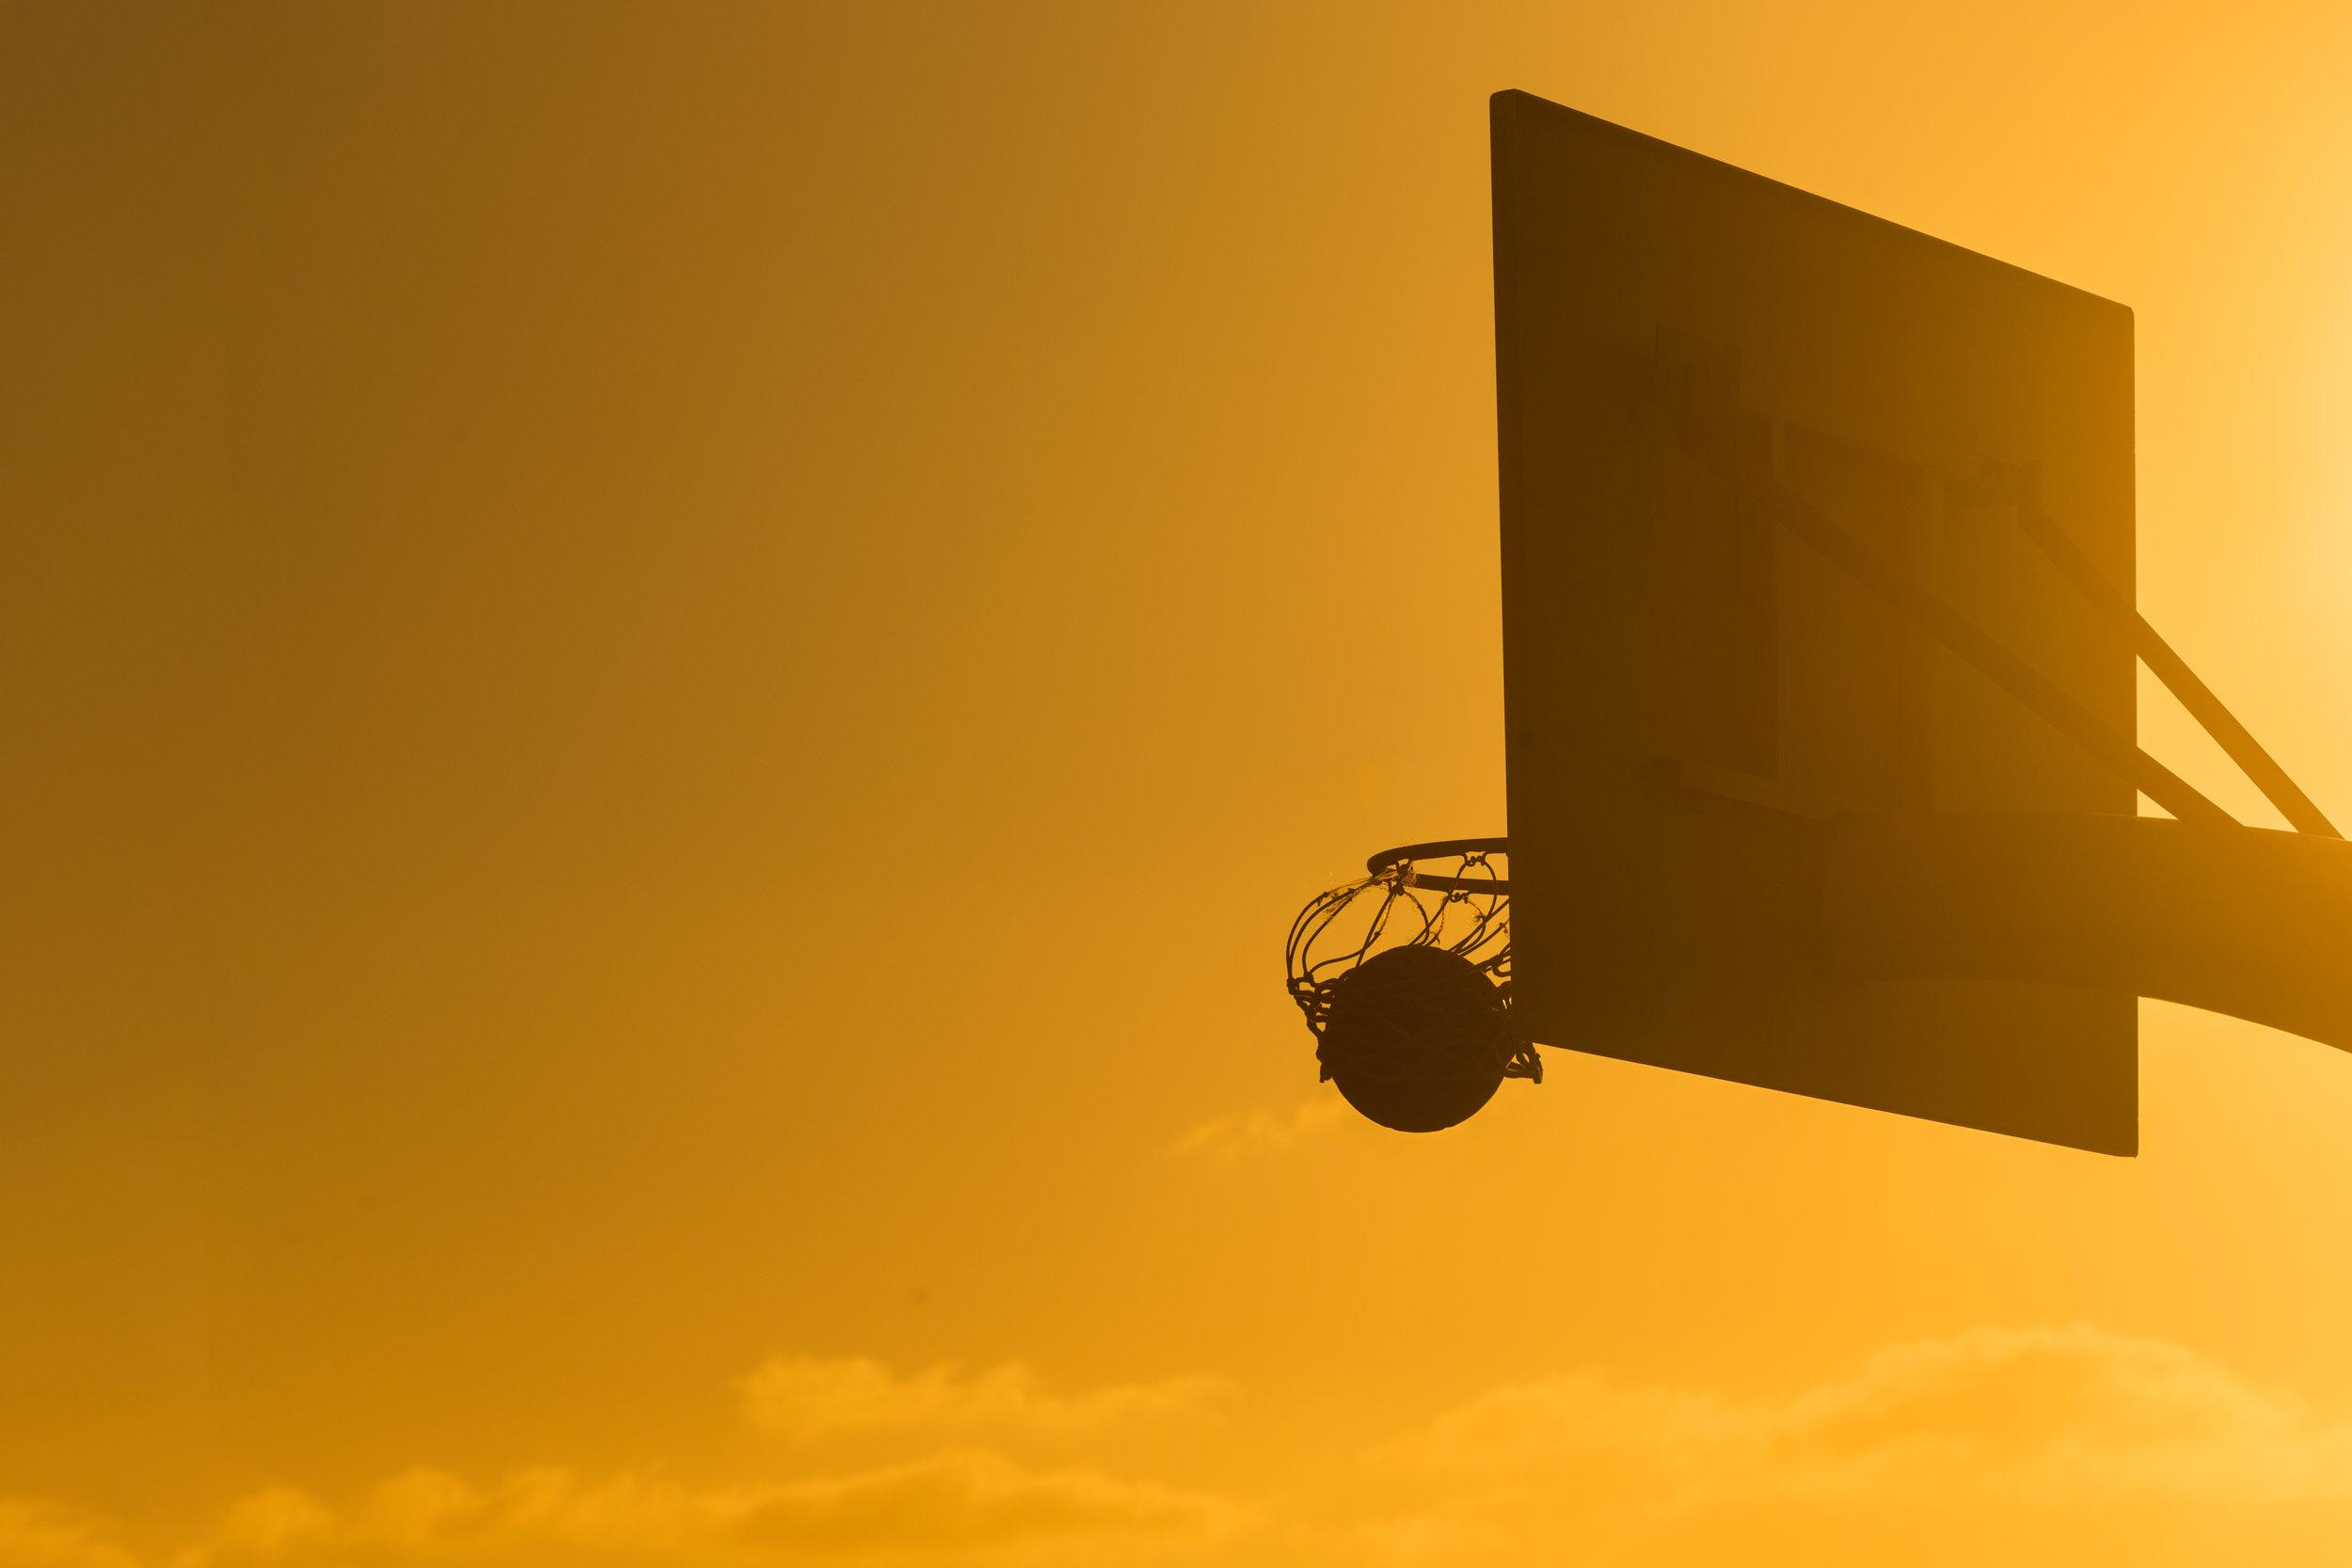 Schoolyard Jam 2019 Basketball tournament sign up